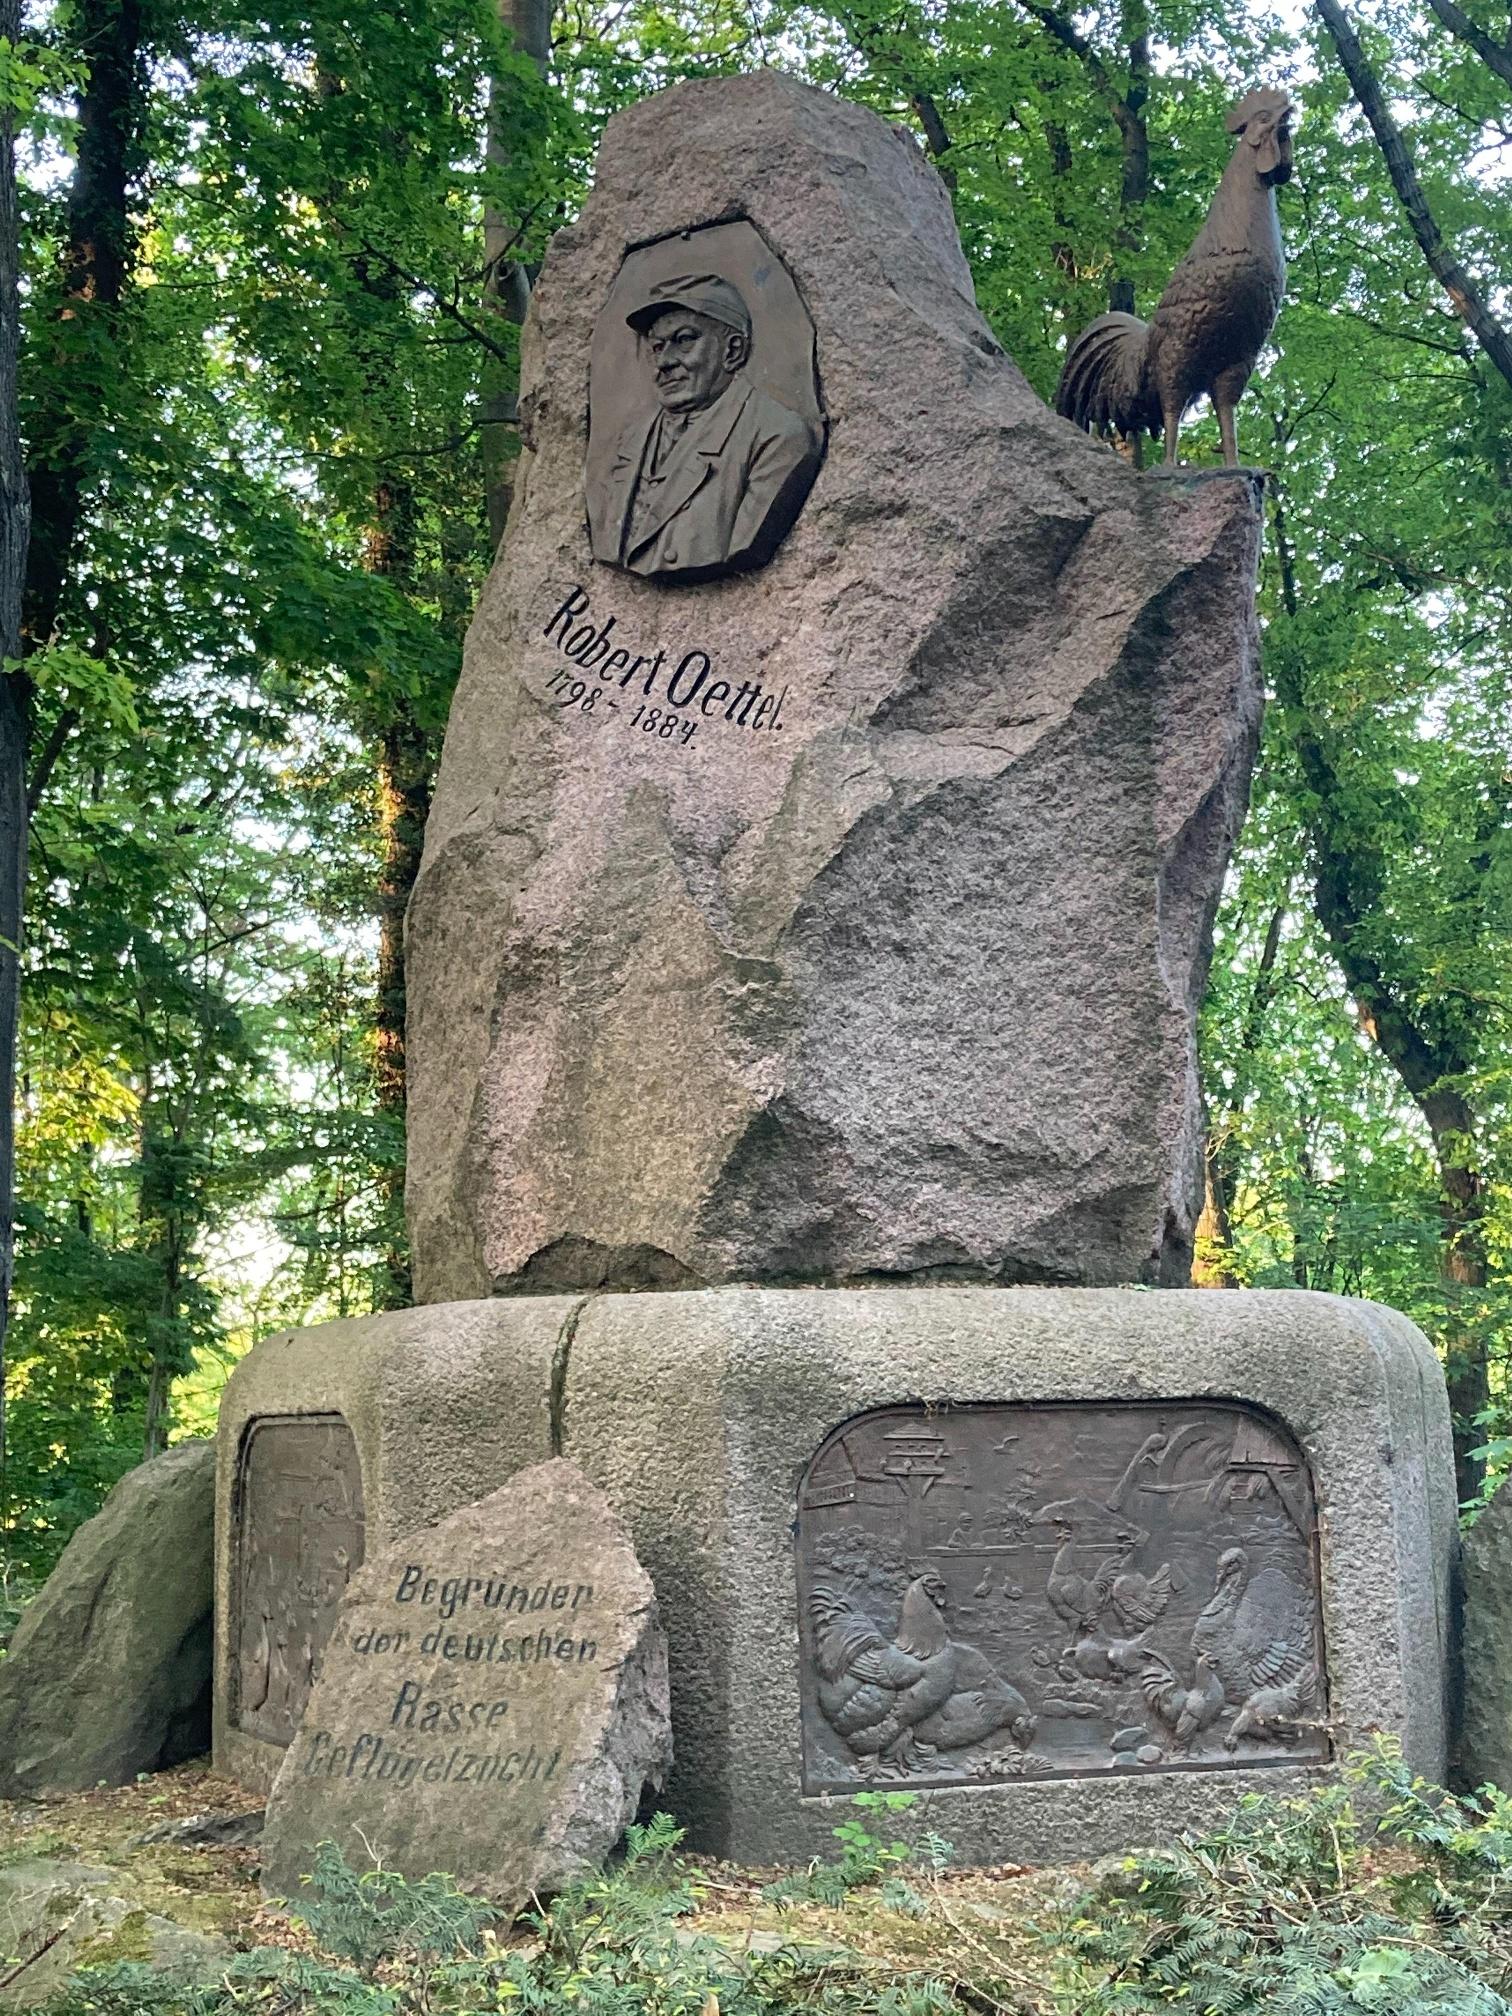 Robert-Oettel-Denkmal, Görlitz